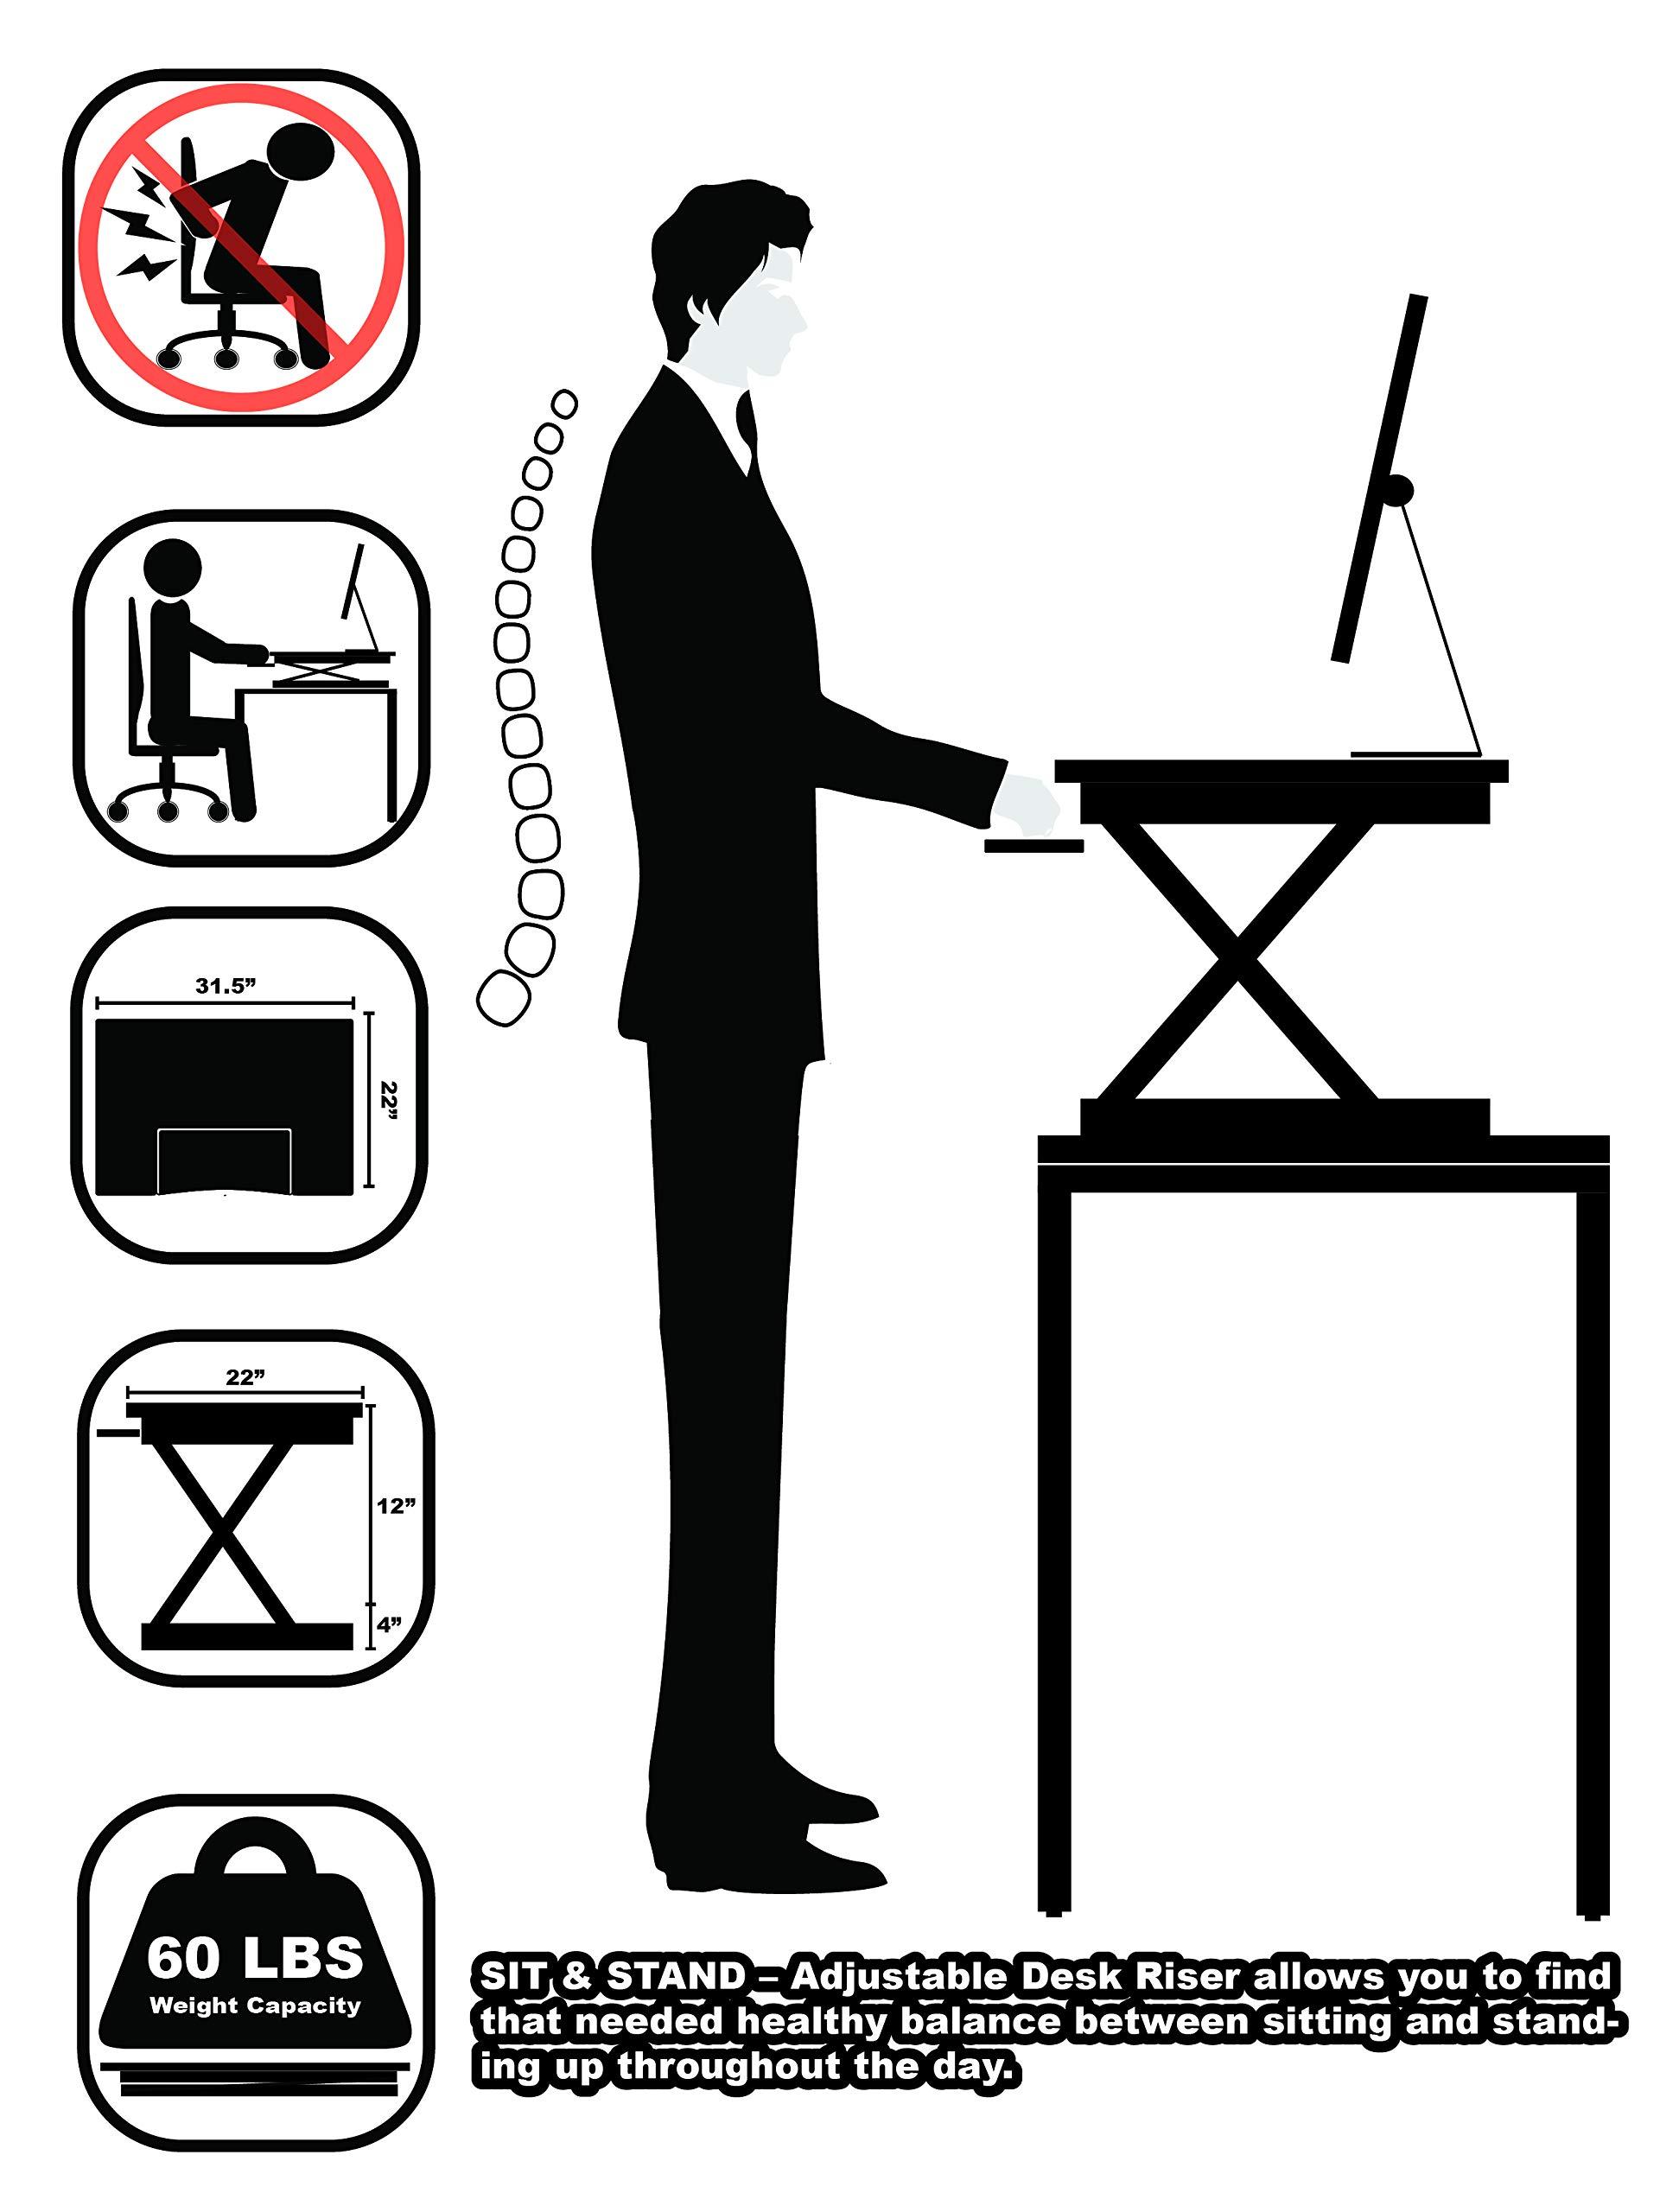 SHW Height Adjustable Sit to Stand Desk Riser Converter Workstation, Black by SHW (Image #3)